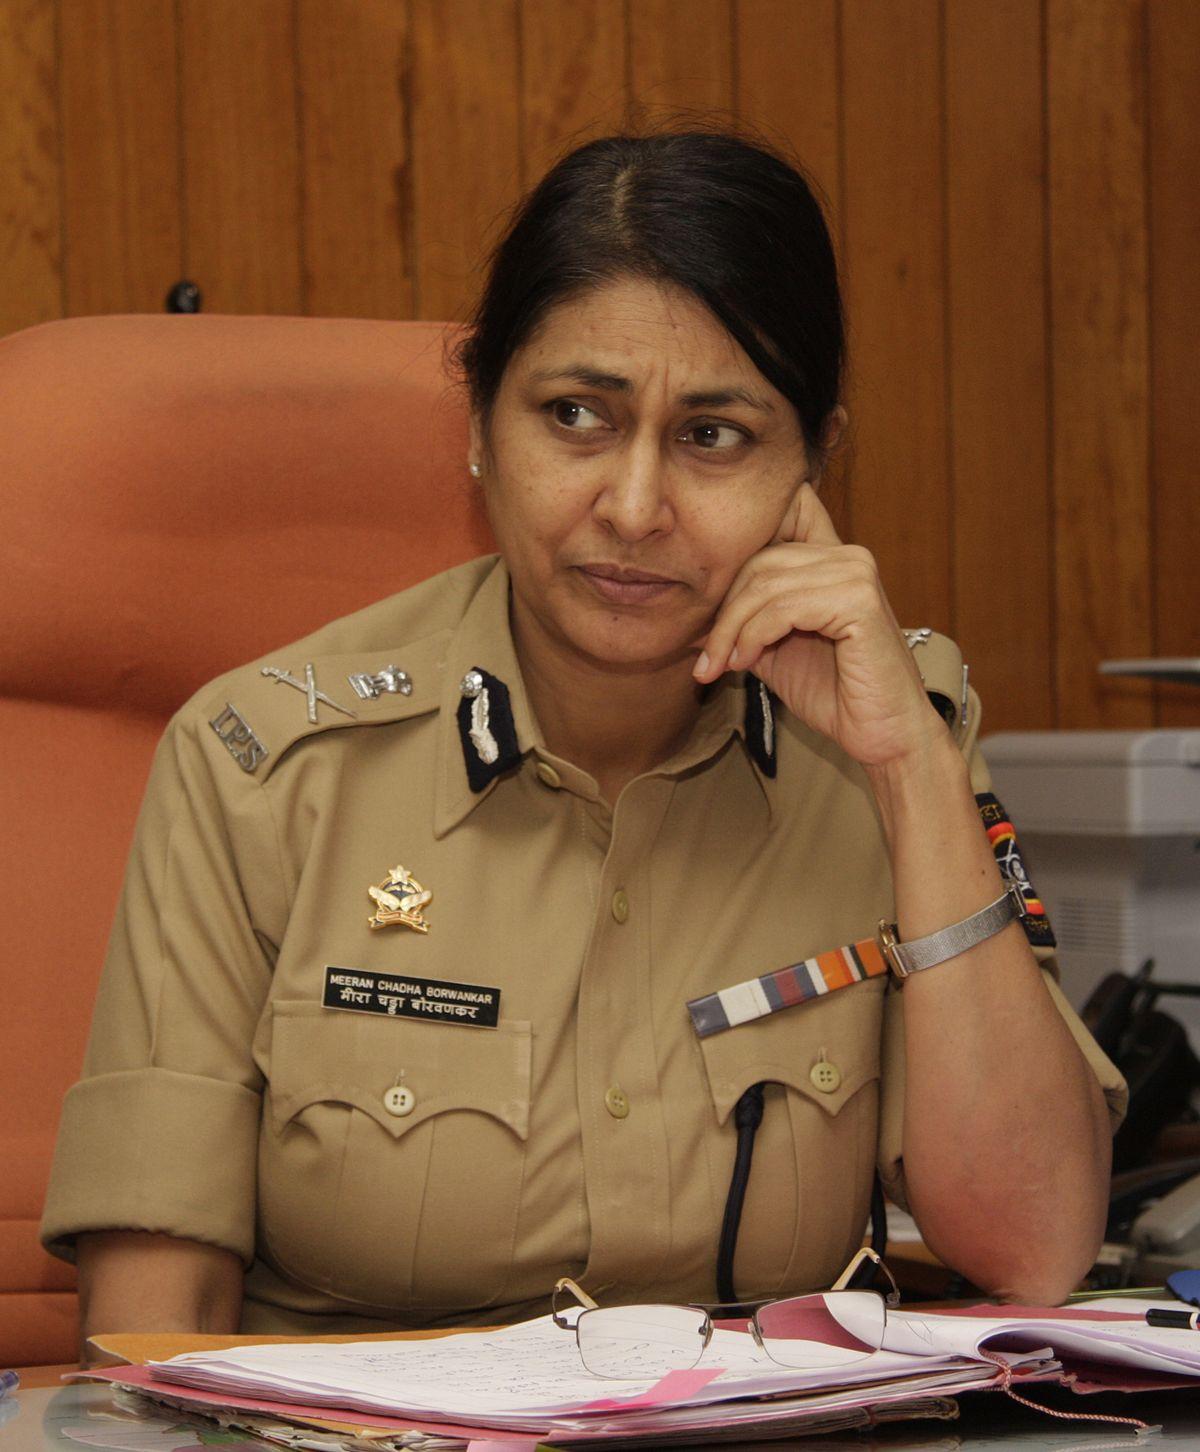 238 best Punjabi funny jokes images on Pinterest Funny humor Tamilnadu police officers photos